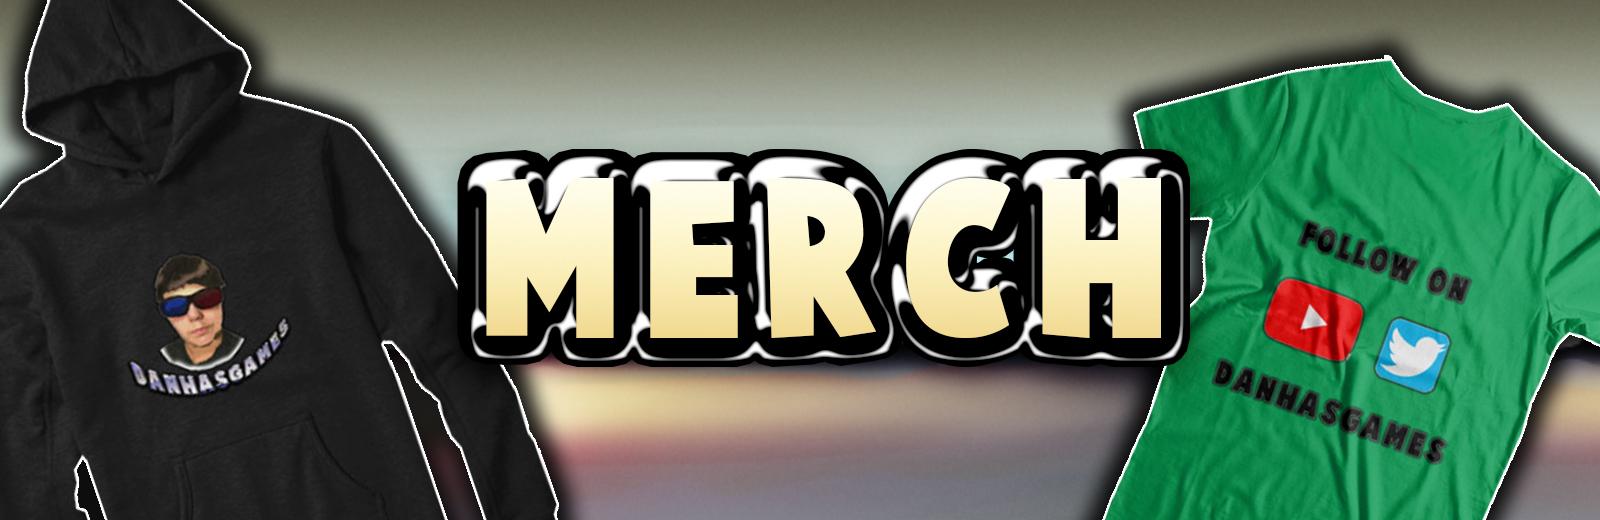 DanHasGames Merch Store